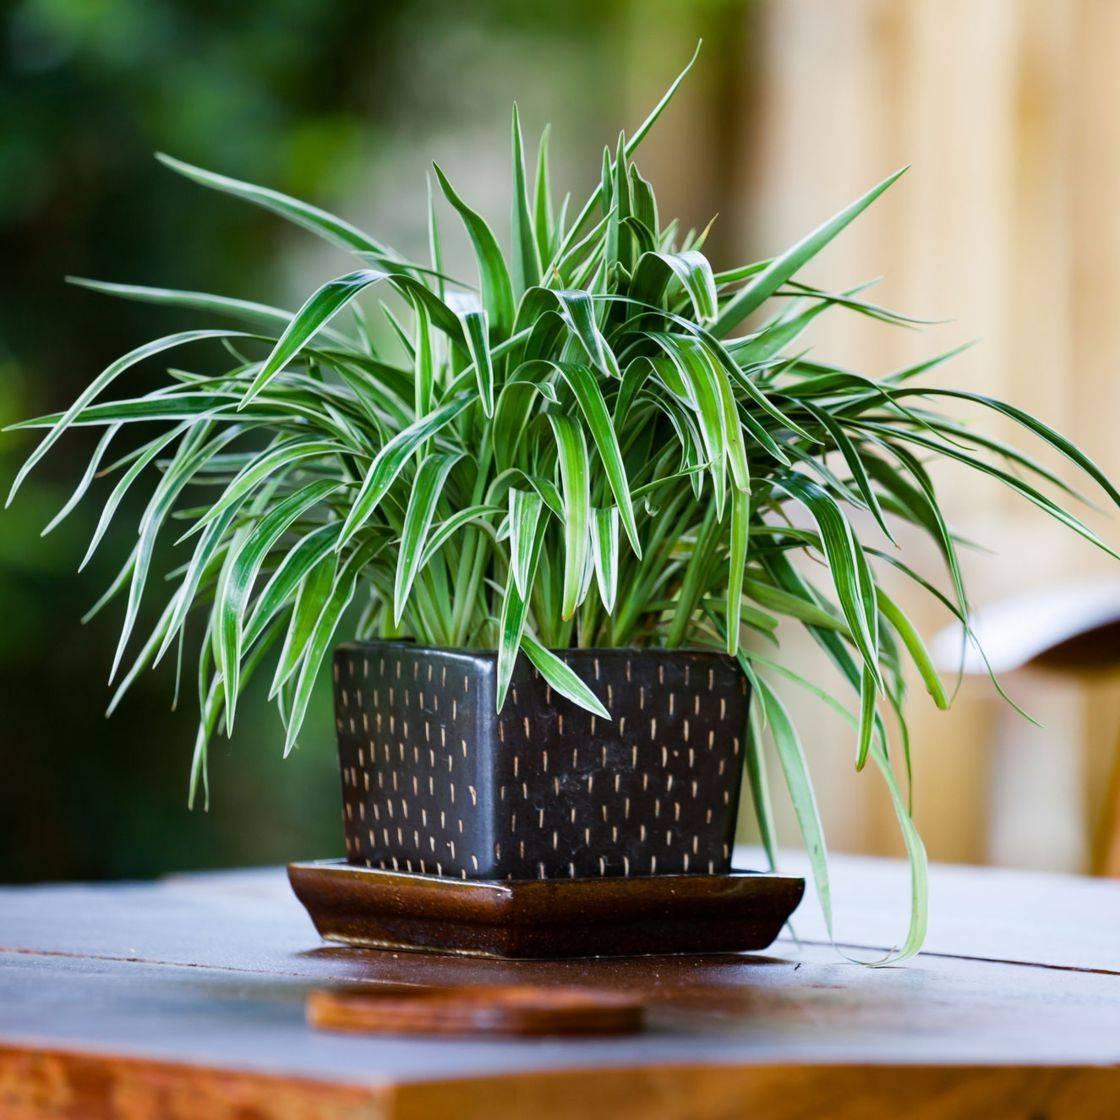 Хлорофитум: уход в домашних условиях за цветком оранжевым, кудрявым хохлатым